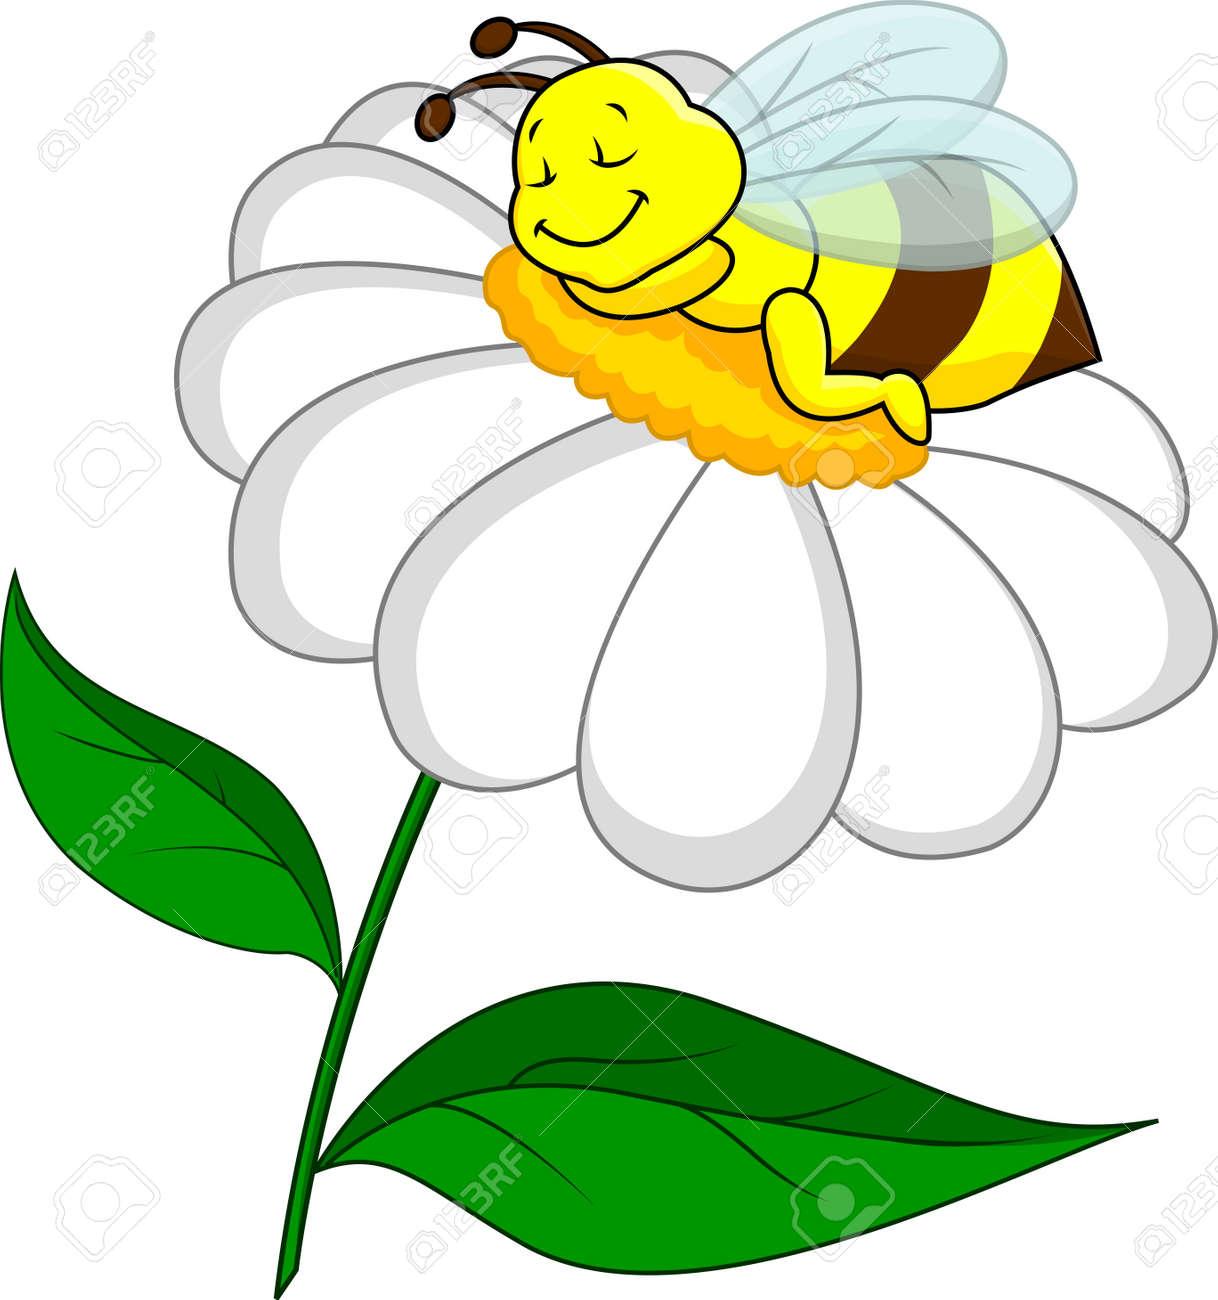 Bee sleeping on flower - 15234326